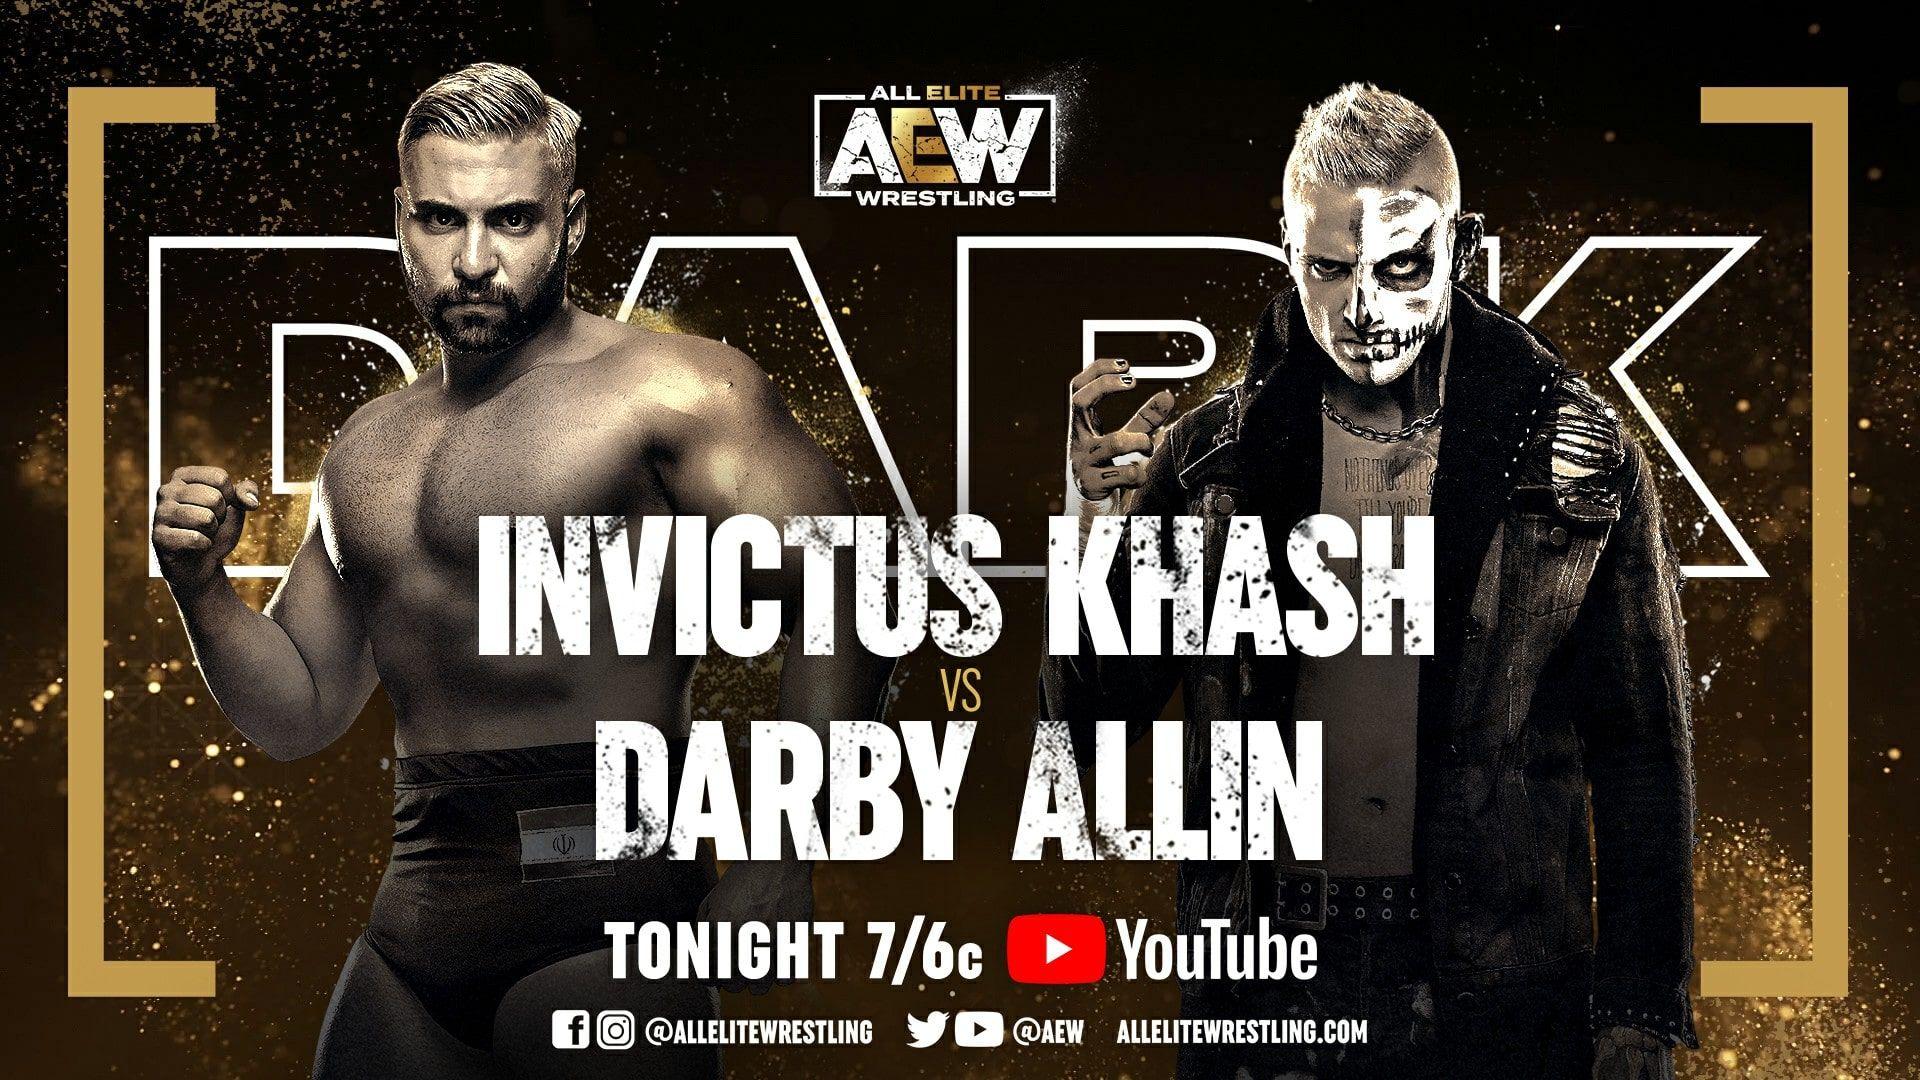 AEW Announces 18 Matches For Tomorrow's AEW Dark